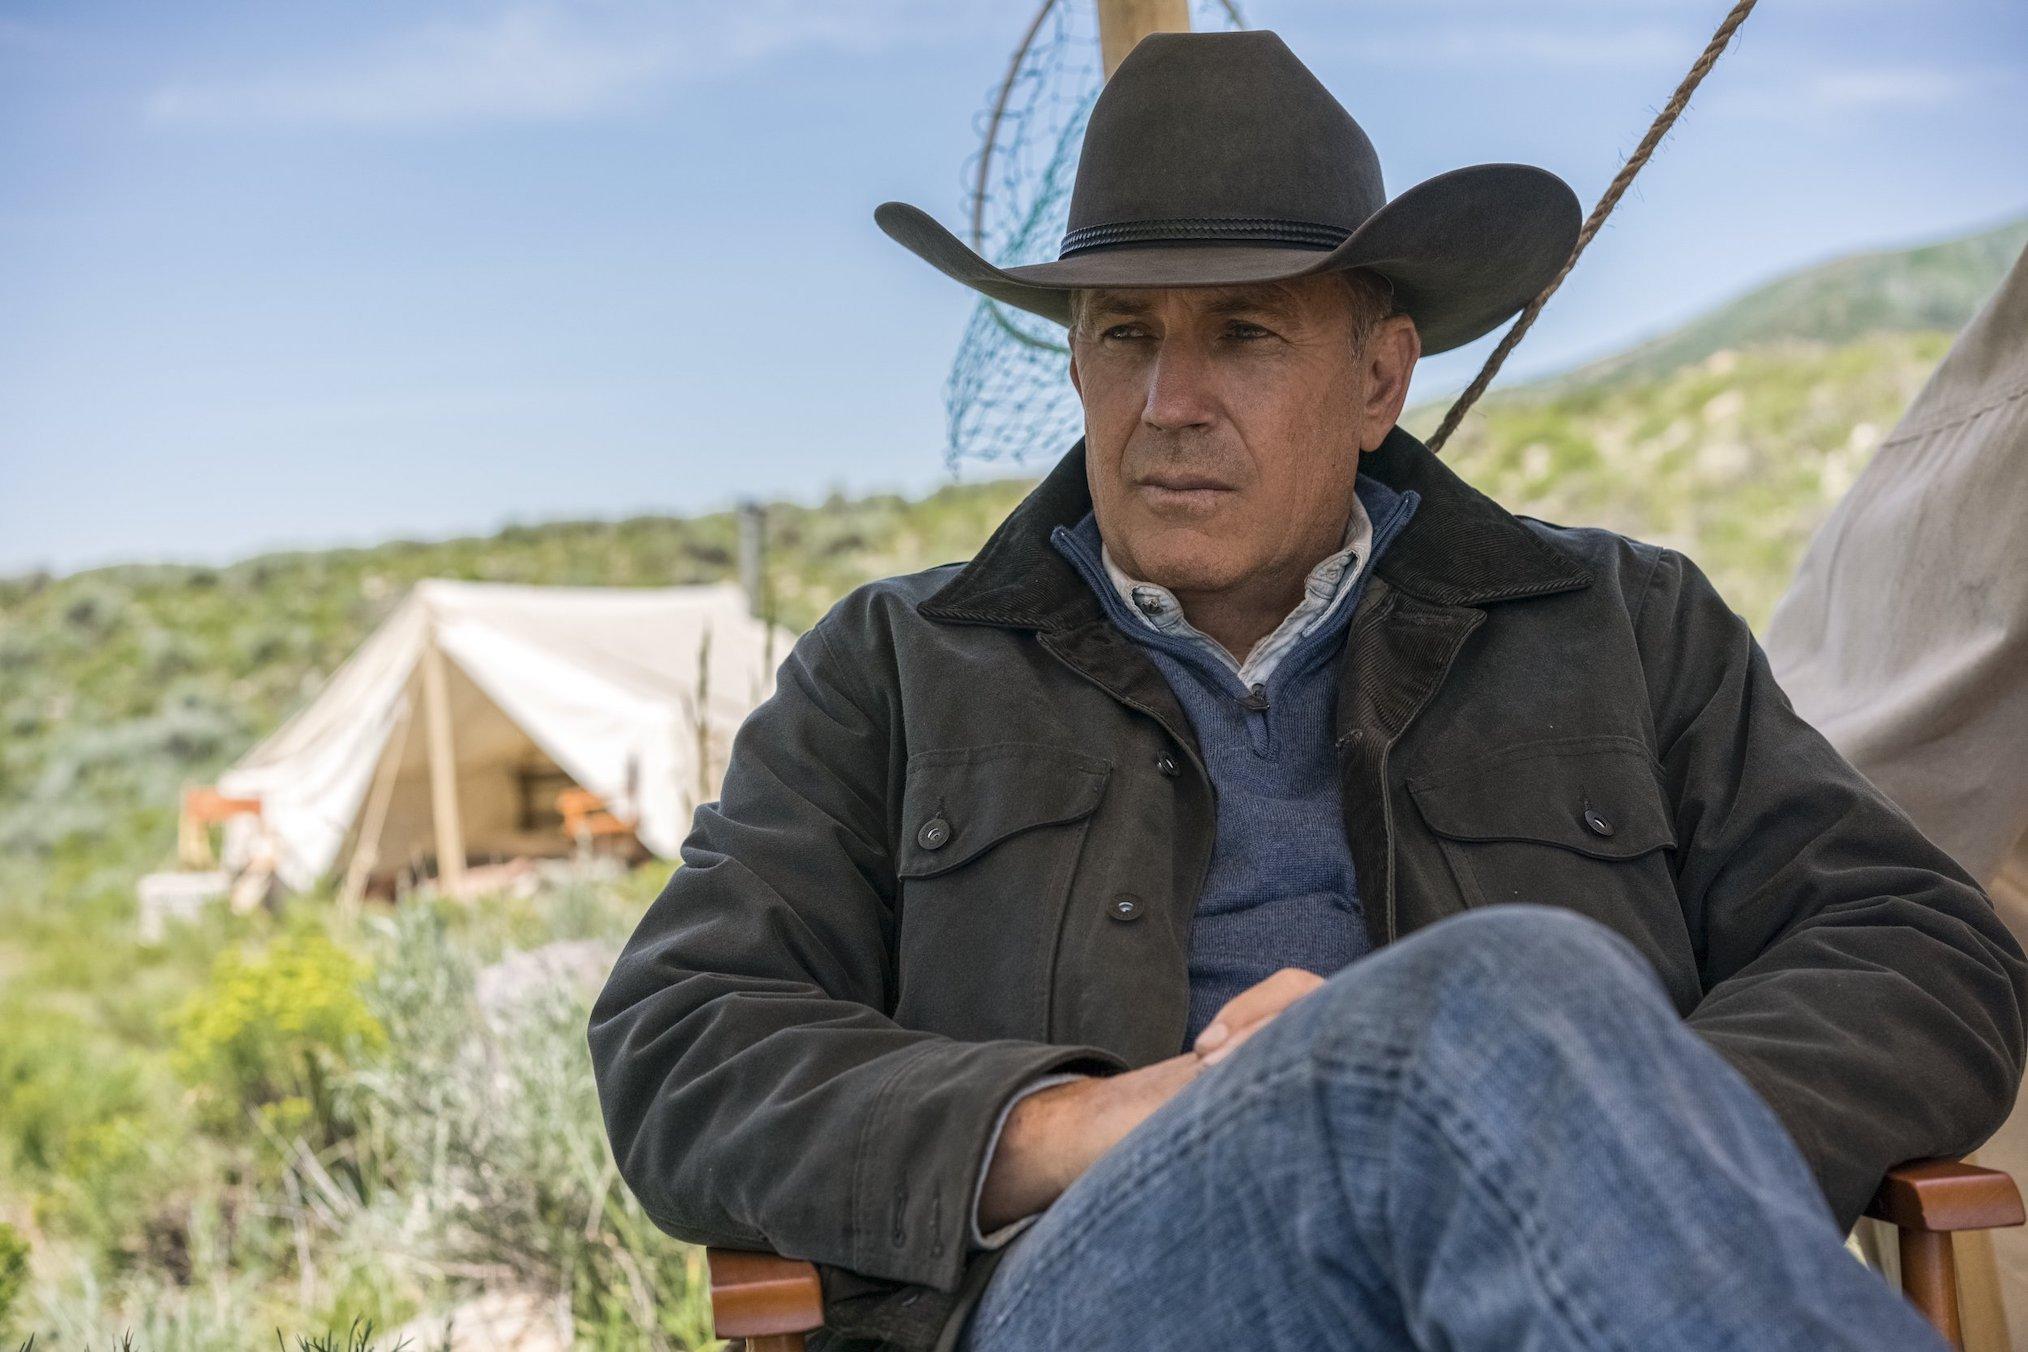 Kevin Costner Yellowstone Season 3 Episode 2 John Dutton